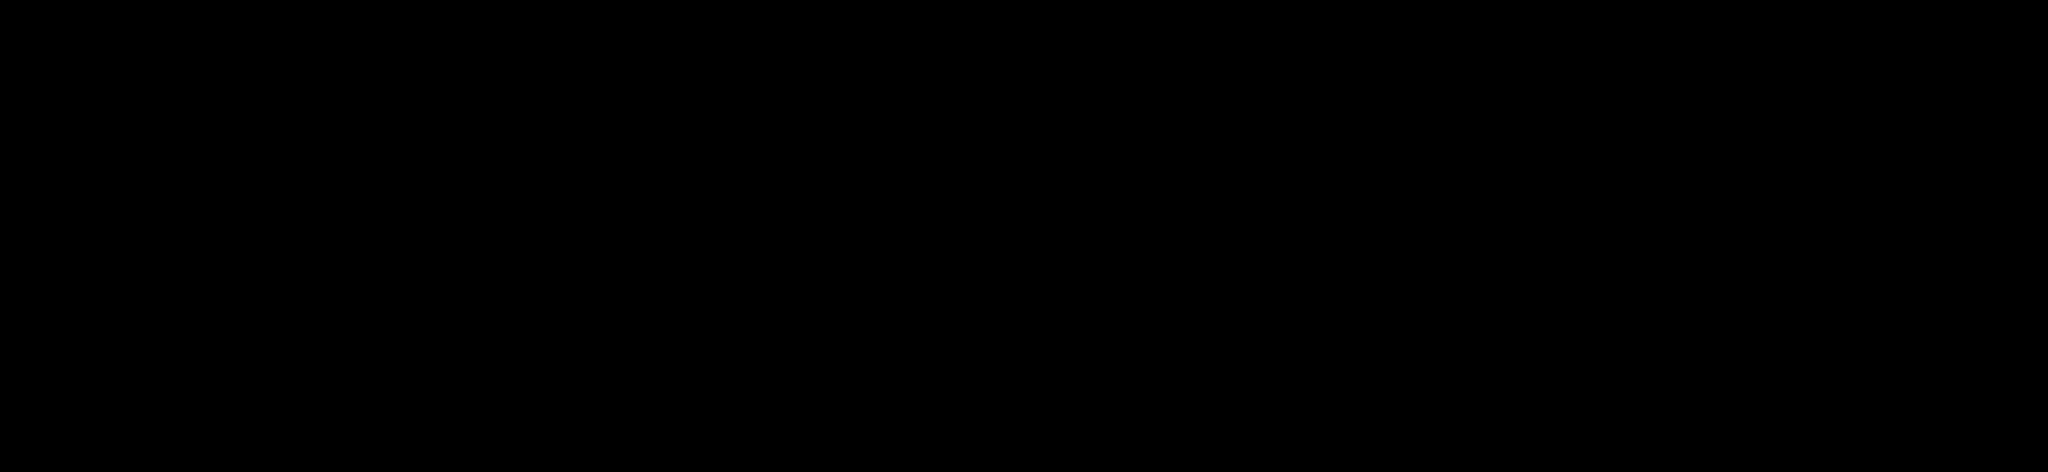 fleshlube